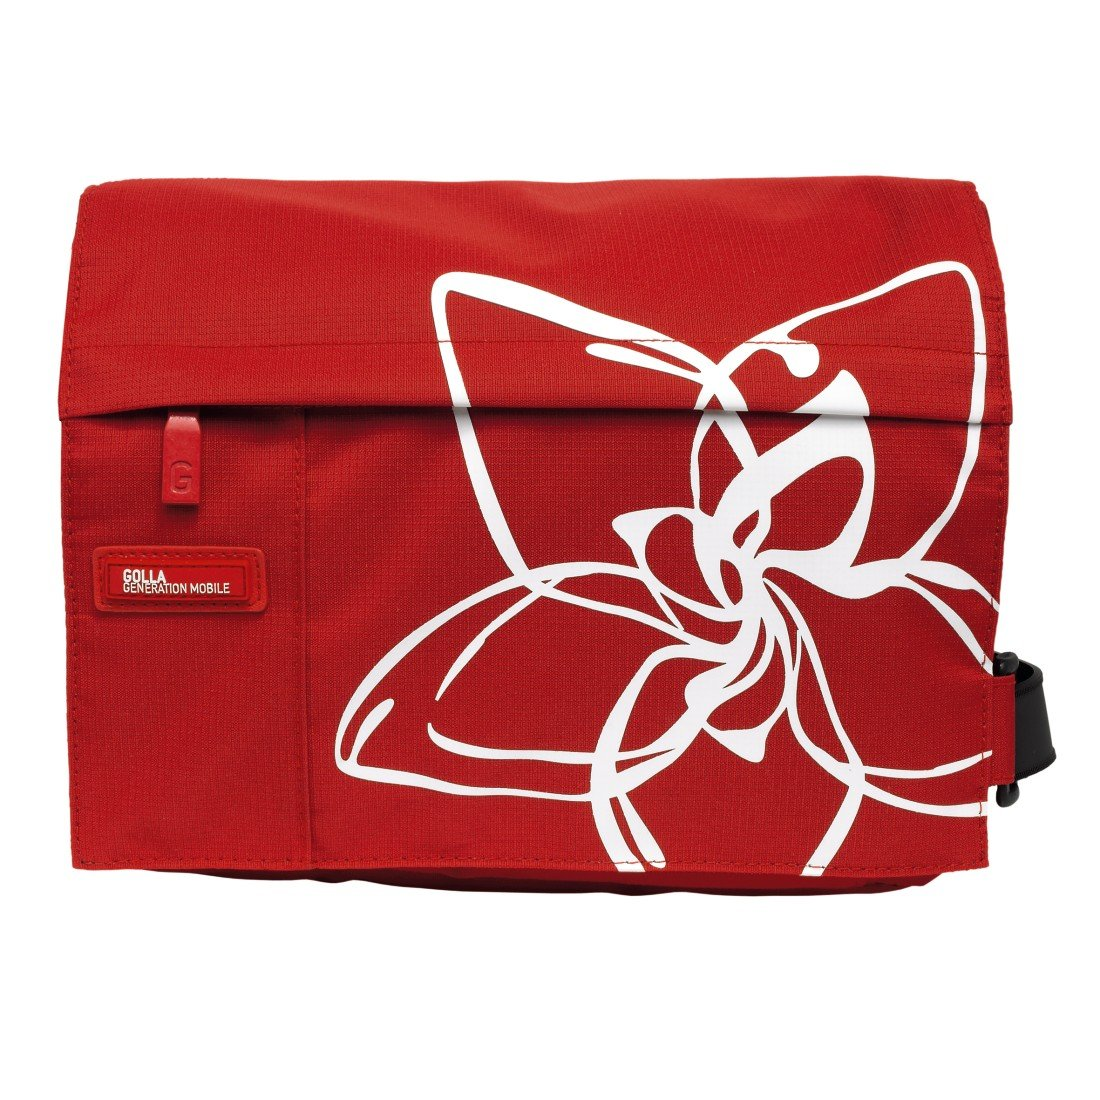 b4804483d0 Amazon.com   Golla Erica Medium Size Camera Bag (Red)   Camera Cases    Electronics